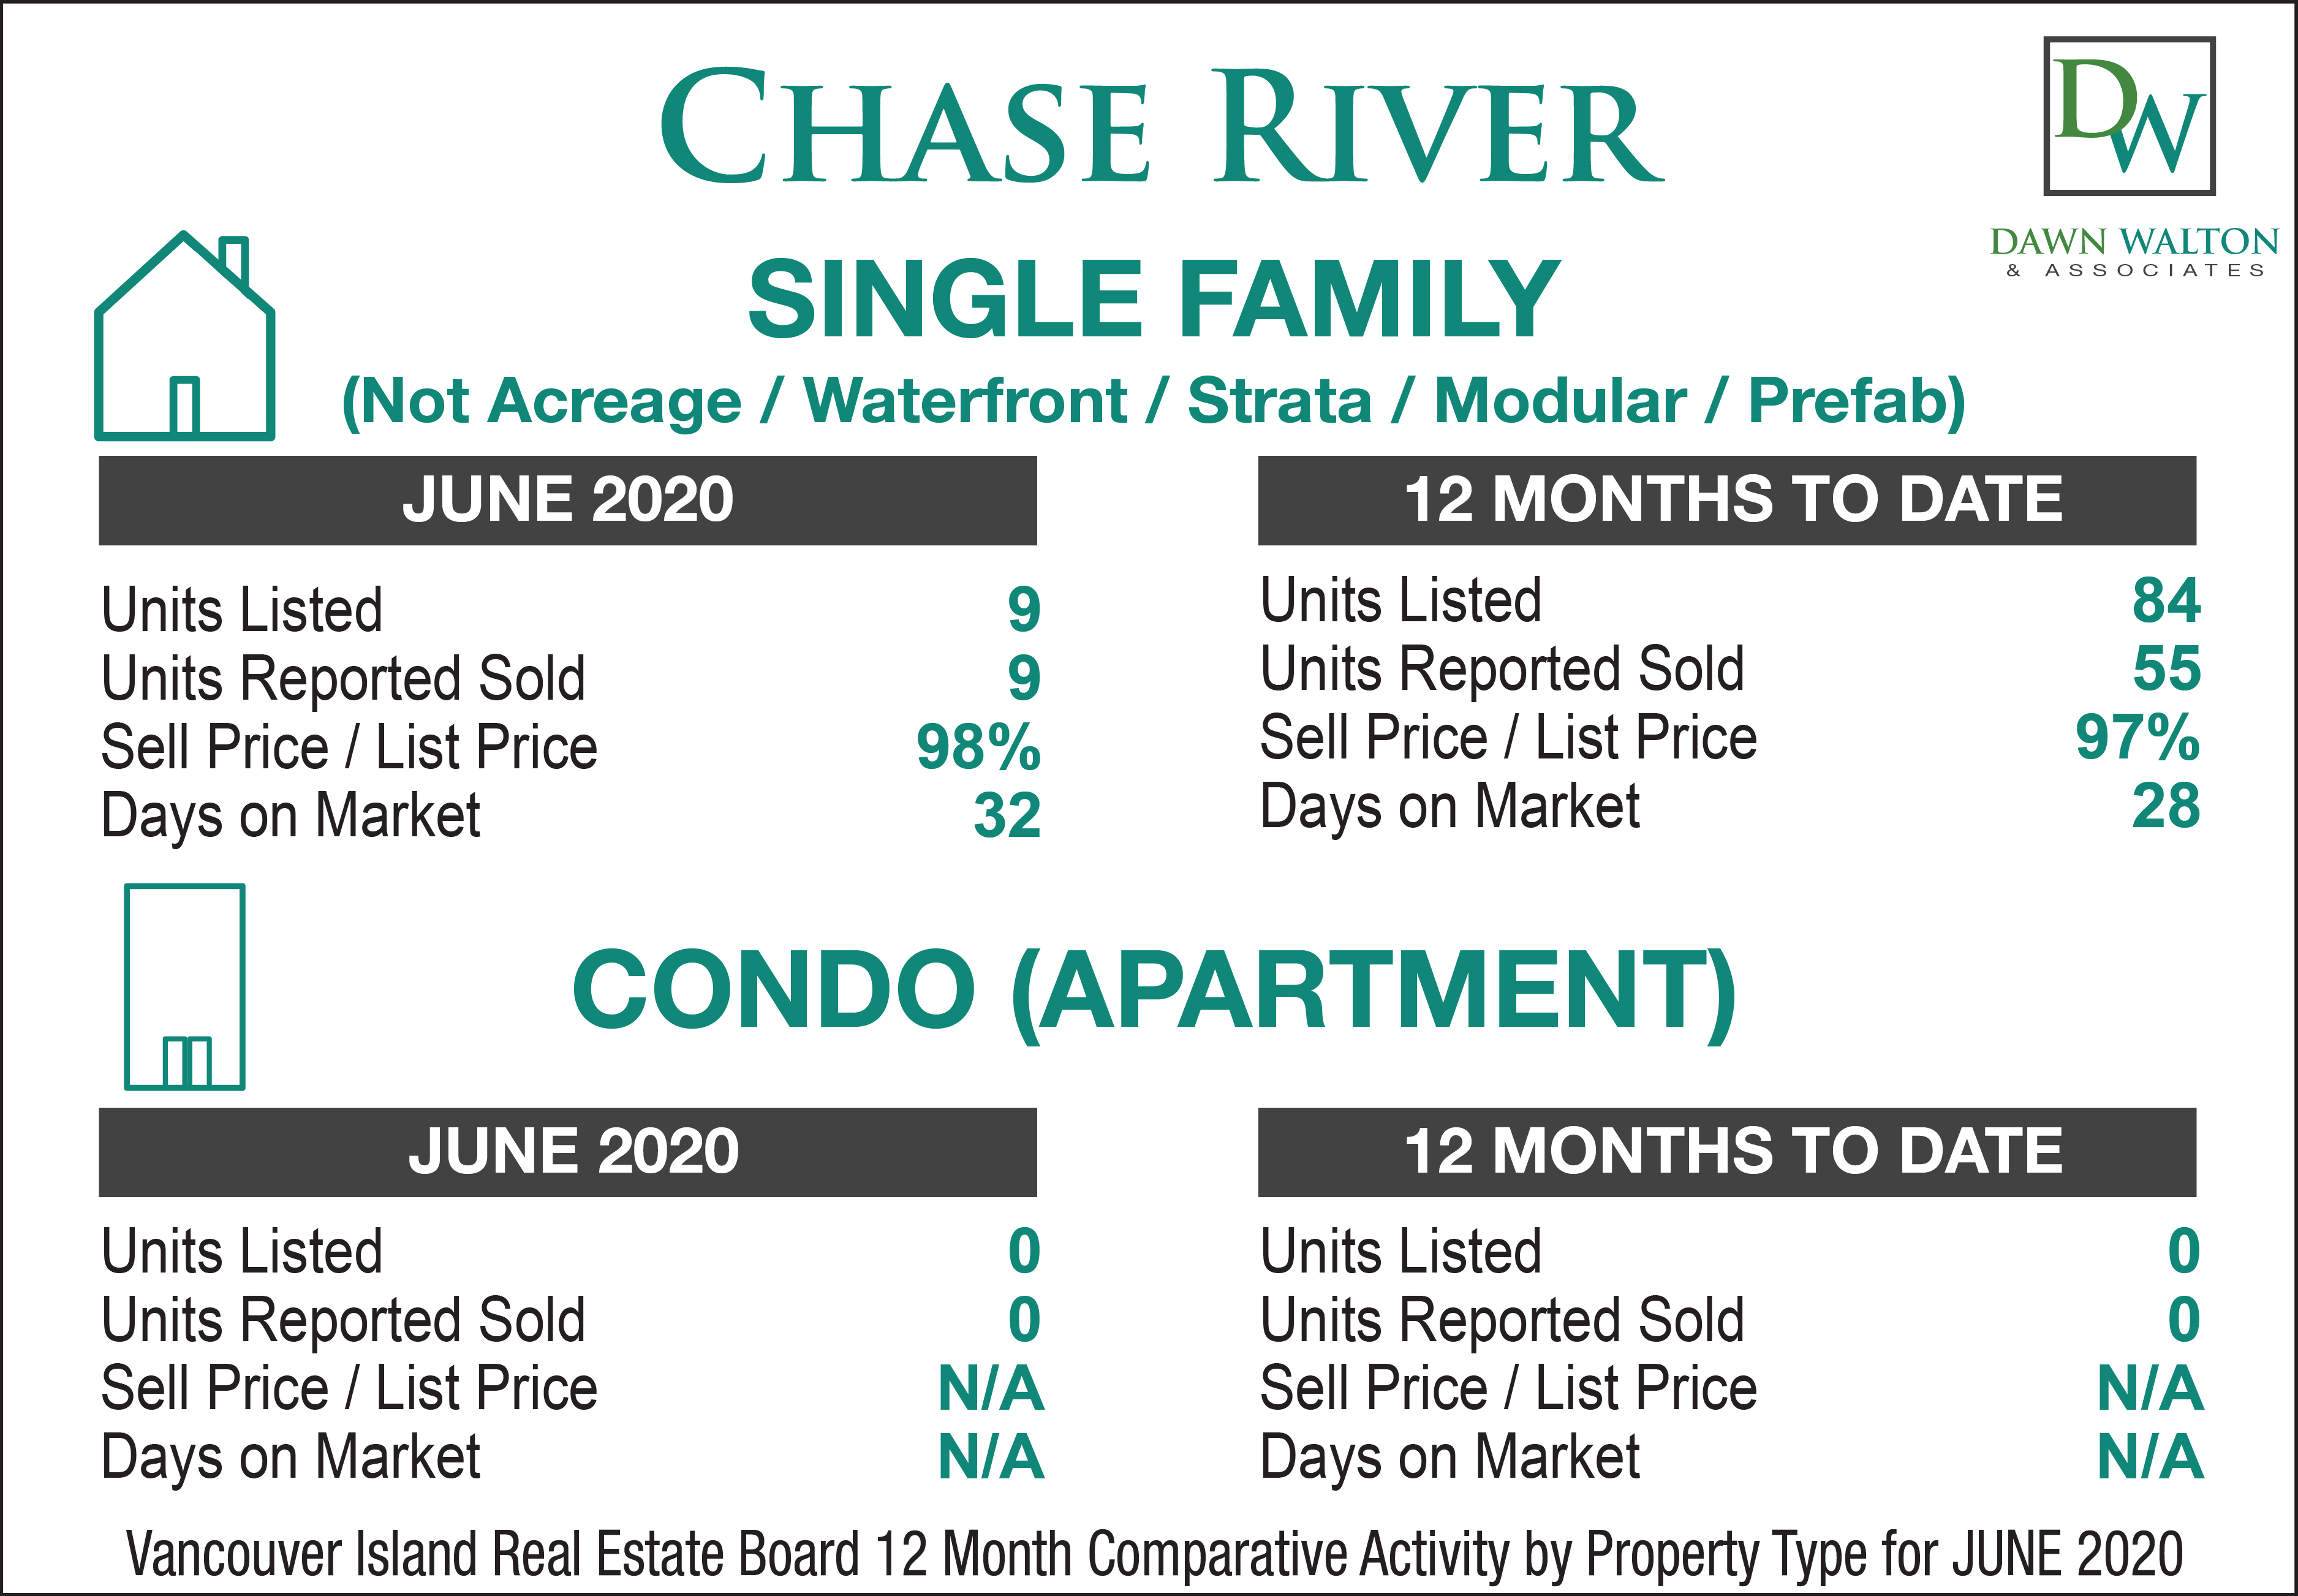 Chase River Real Estate Market Stats June 2020 - Nanaimo Realtor Dawn Walton